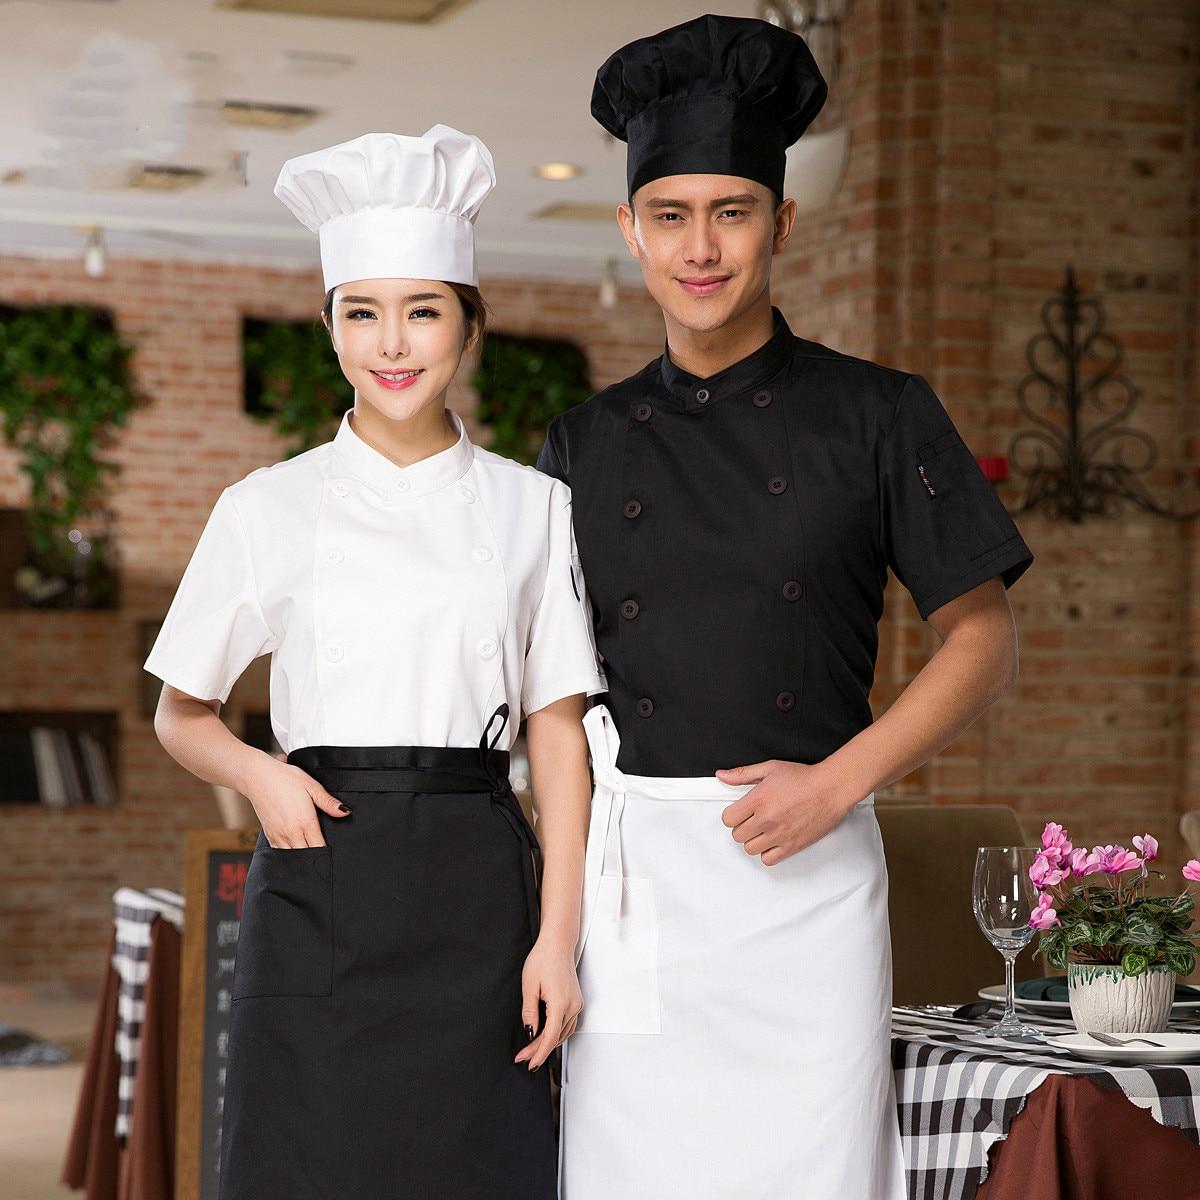 Food Service New Design White Chef Uniform Restaurant Desktop Kitchen Of Computer Hd Kitchen Cook Jackets For Men And